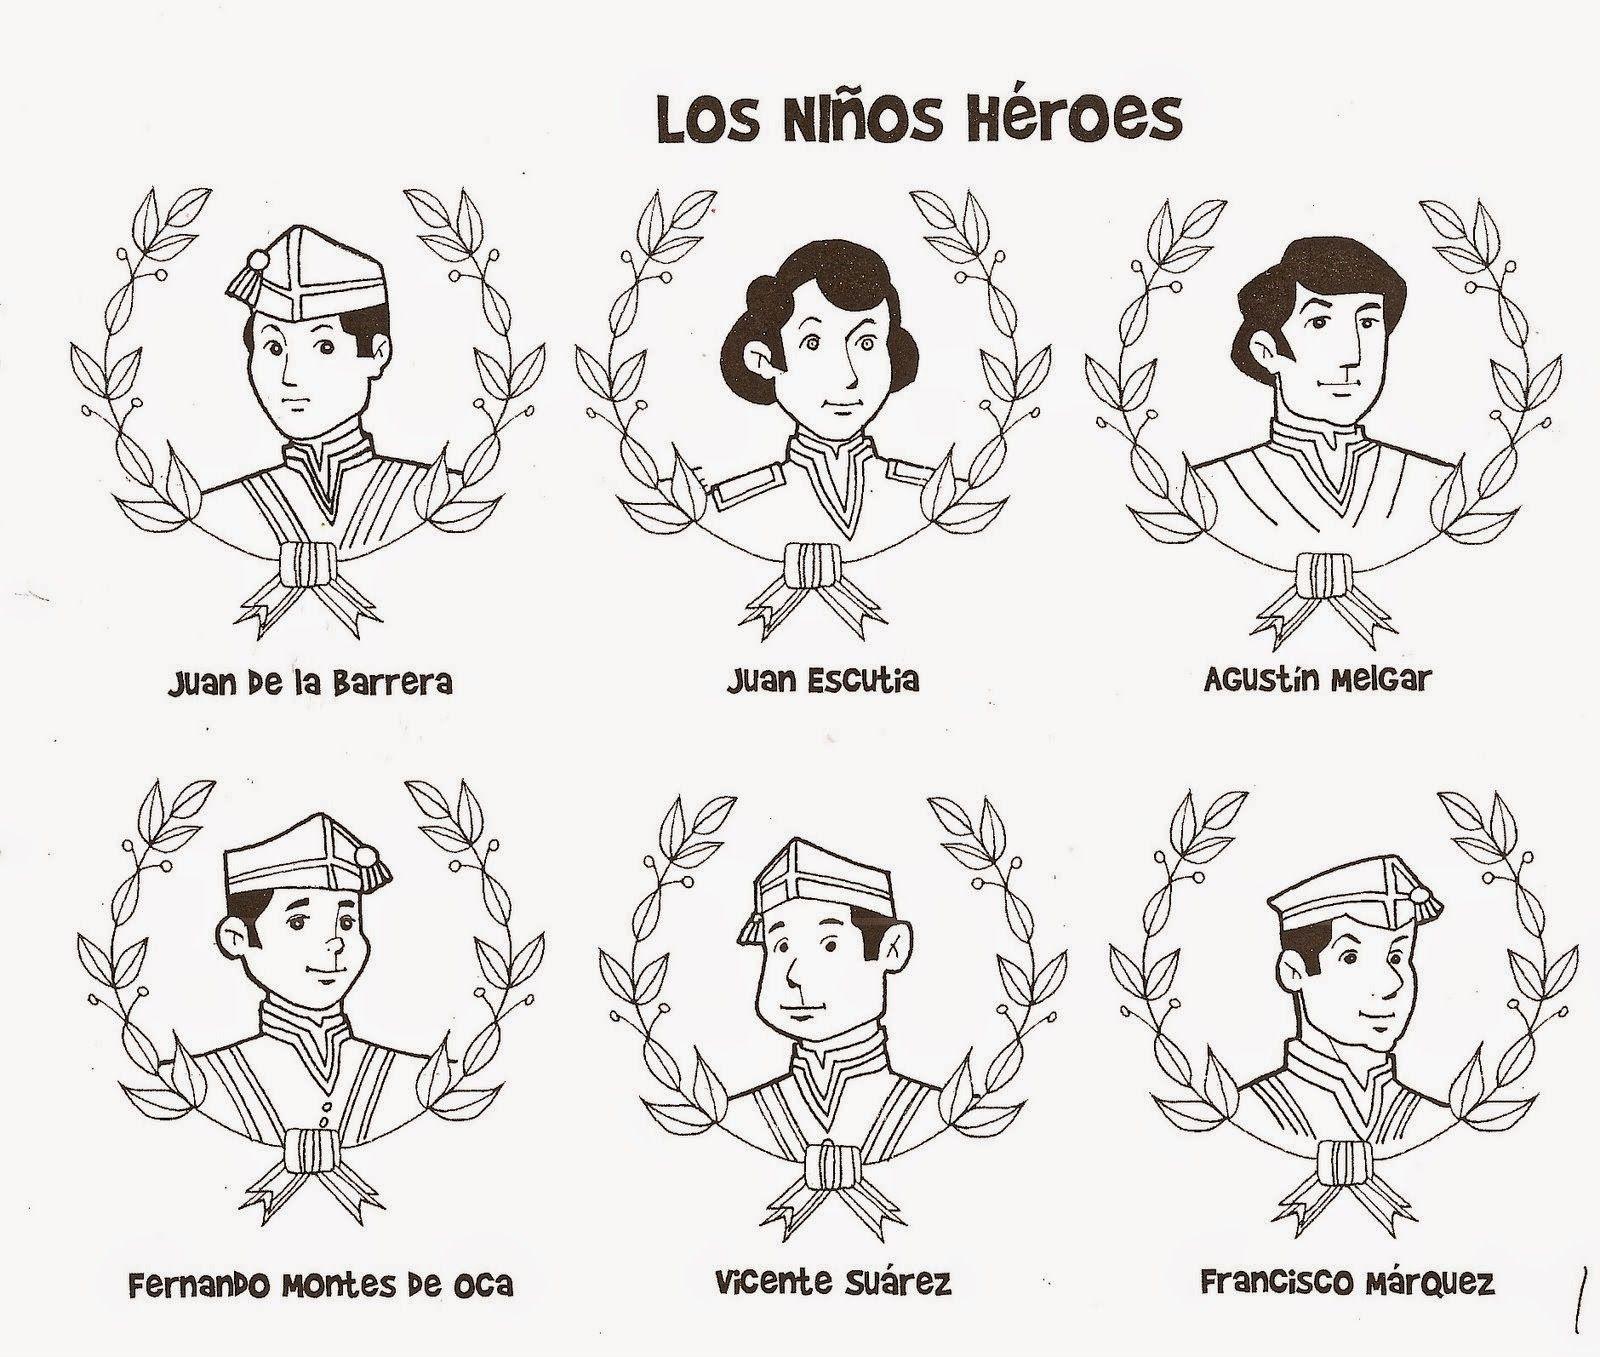 Castillo de chapultepec para colorear - Imagui | Varios | Pinterest ...